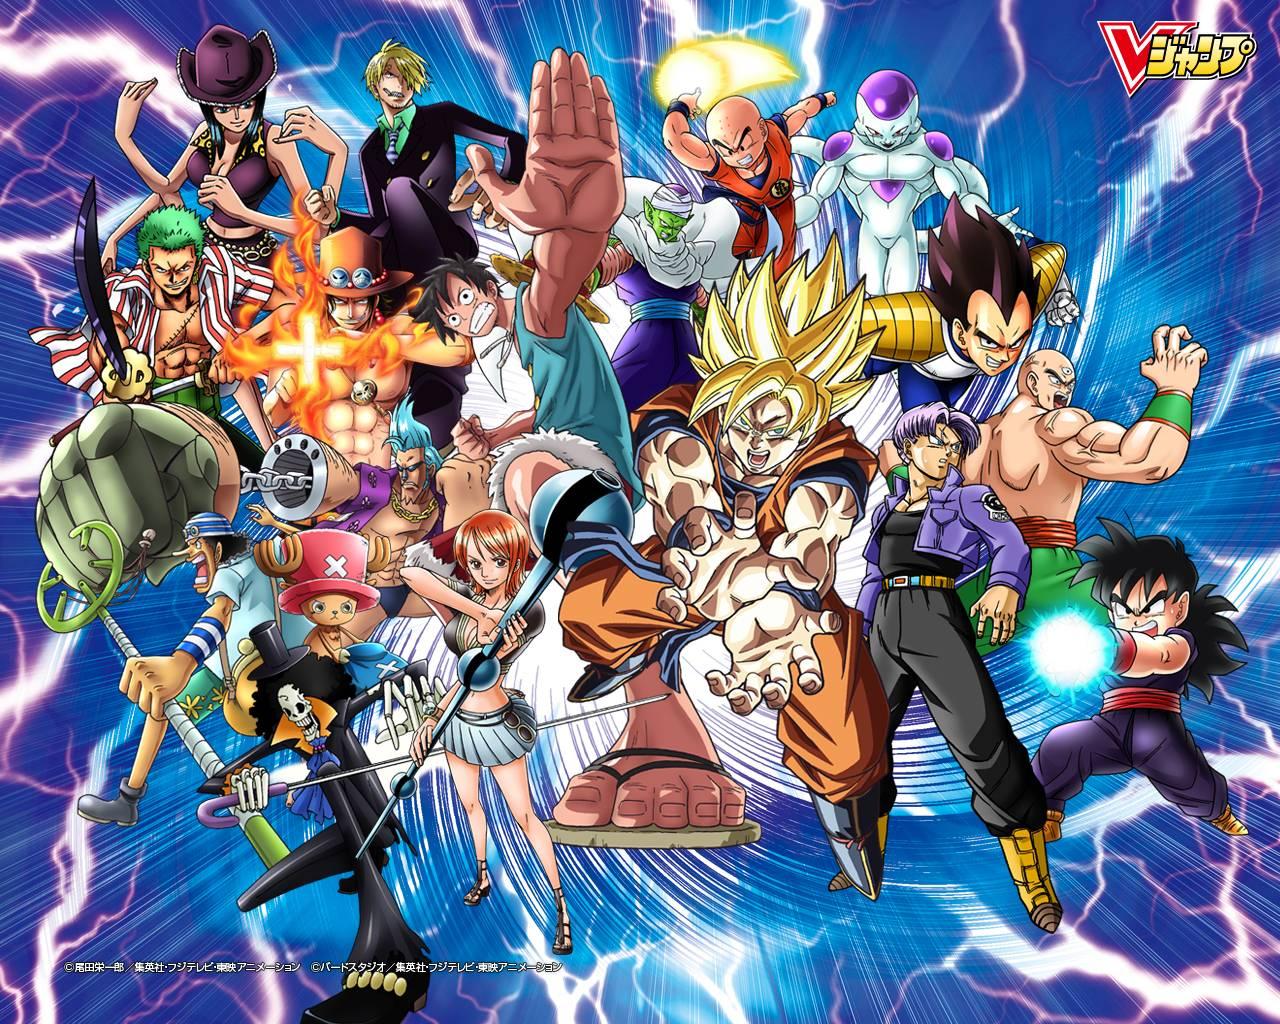 Goku And Naruto Wallpapers Wallpaper Cave